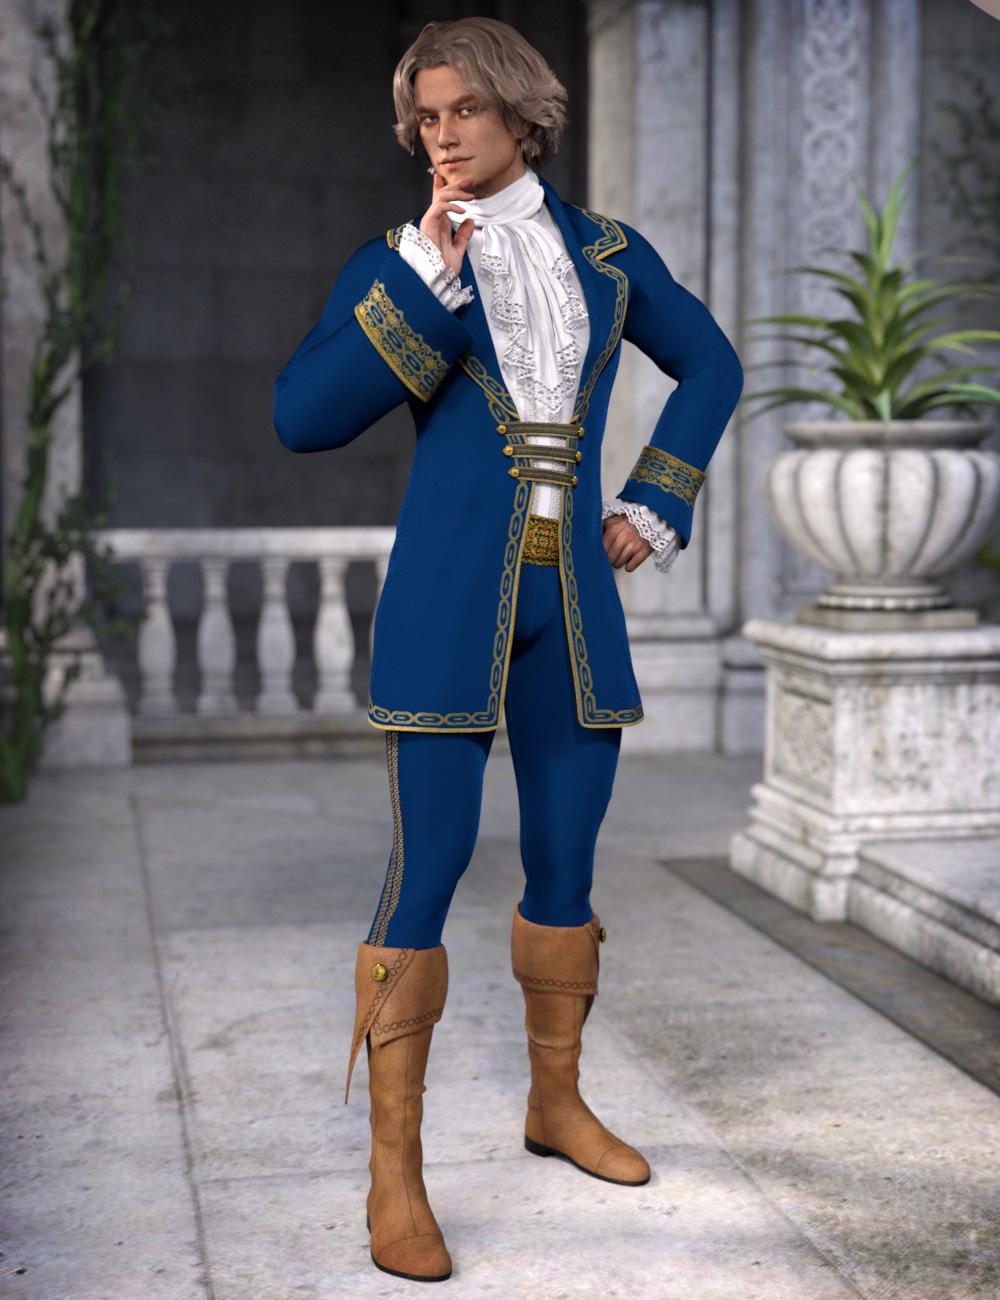 Fairytale Prince for Genesis 3 Male(s) by: esha, 3D Models by Daz 3D